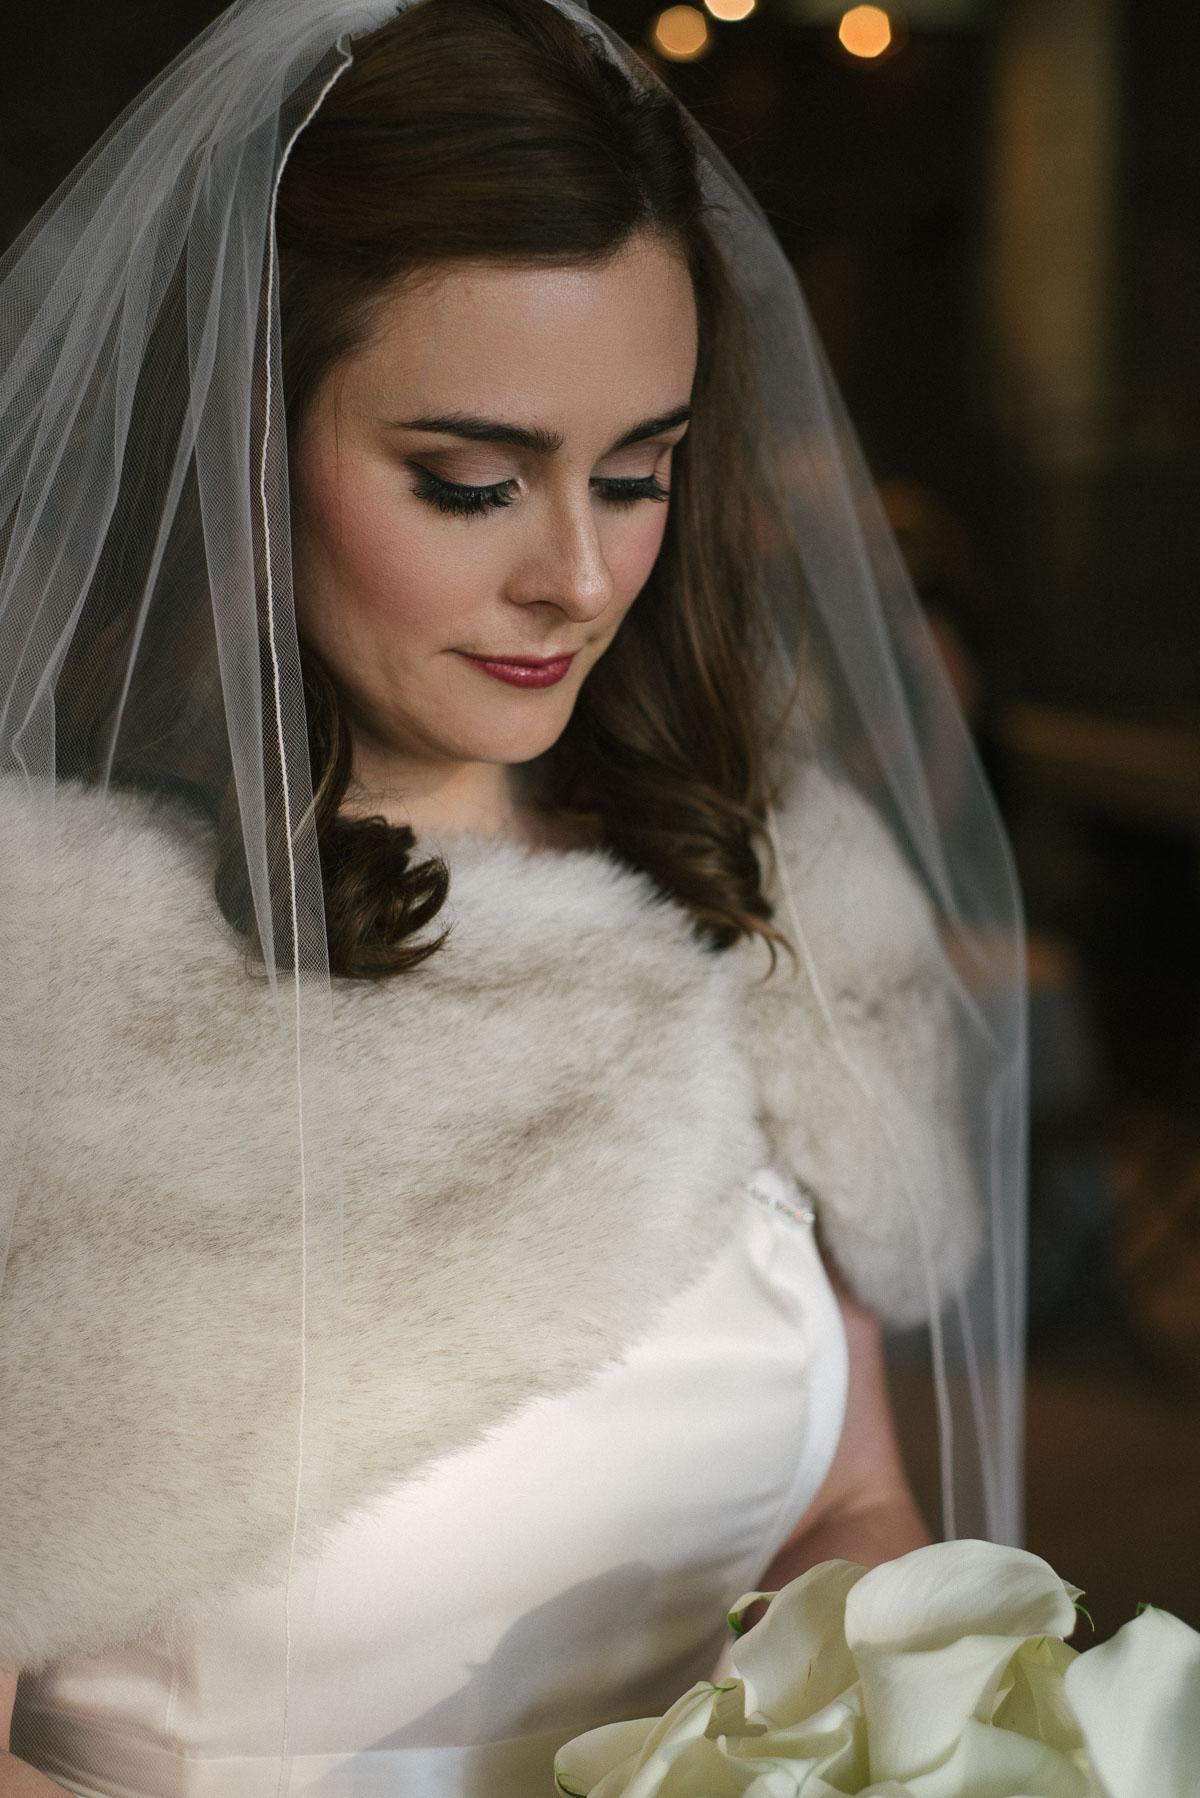 Pamela Yasuko Photography - A New Leaf Wedding - Chicago Oahu Photographer-19.jpg